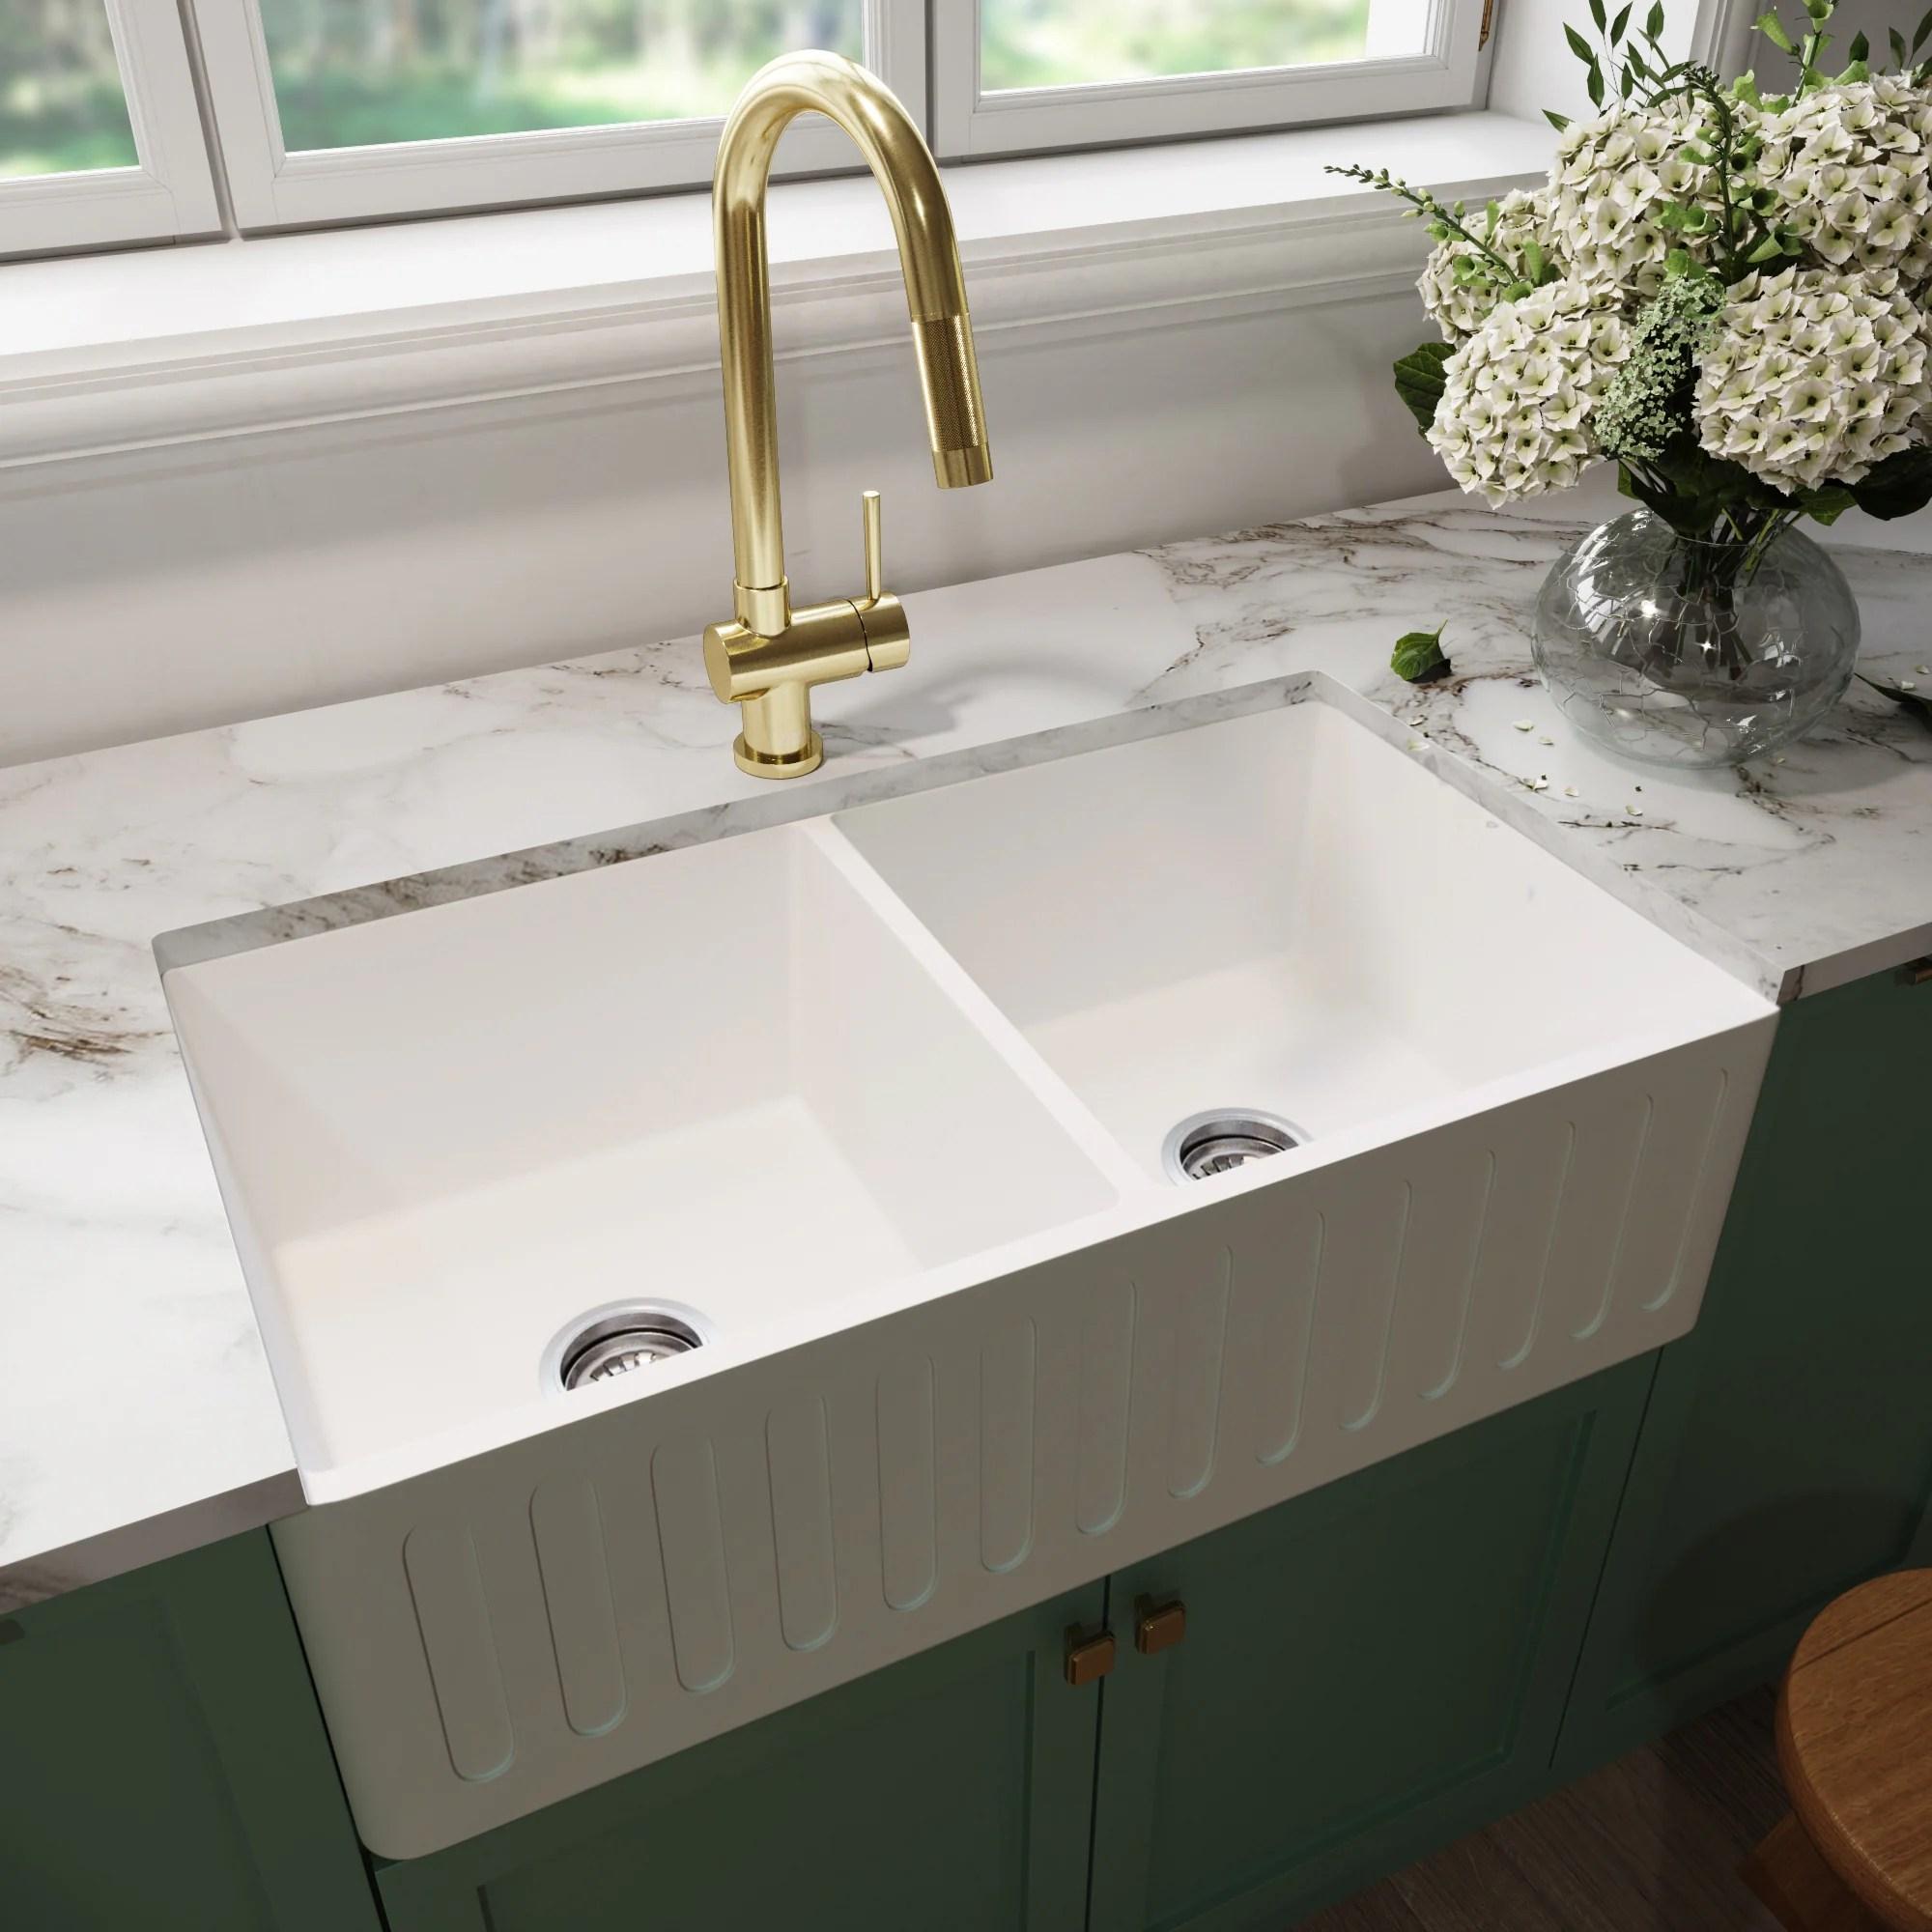 Shop Vigo White 36 Inch Matte Stone Double Bowl Farmhouse Kitchen Sink Overstock 16066698